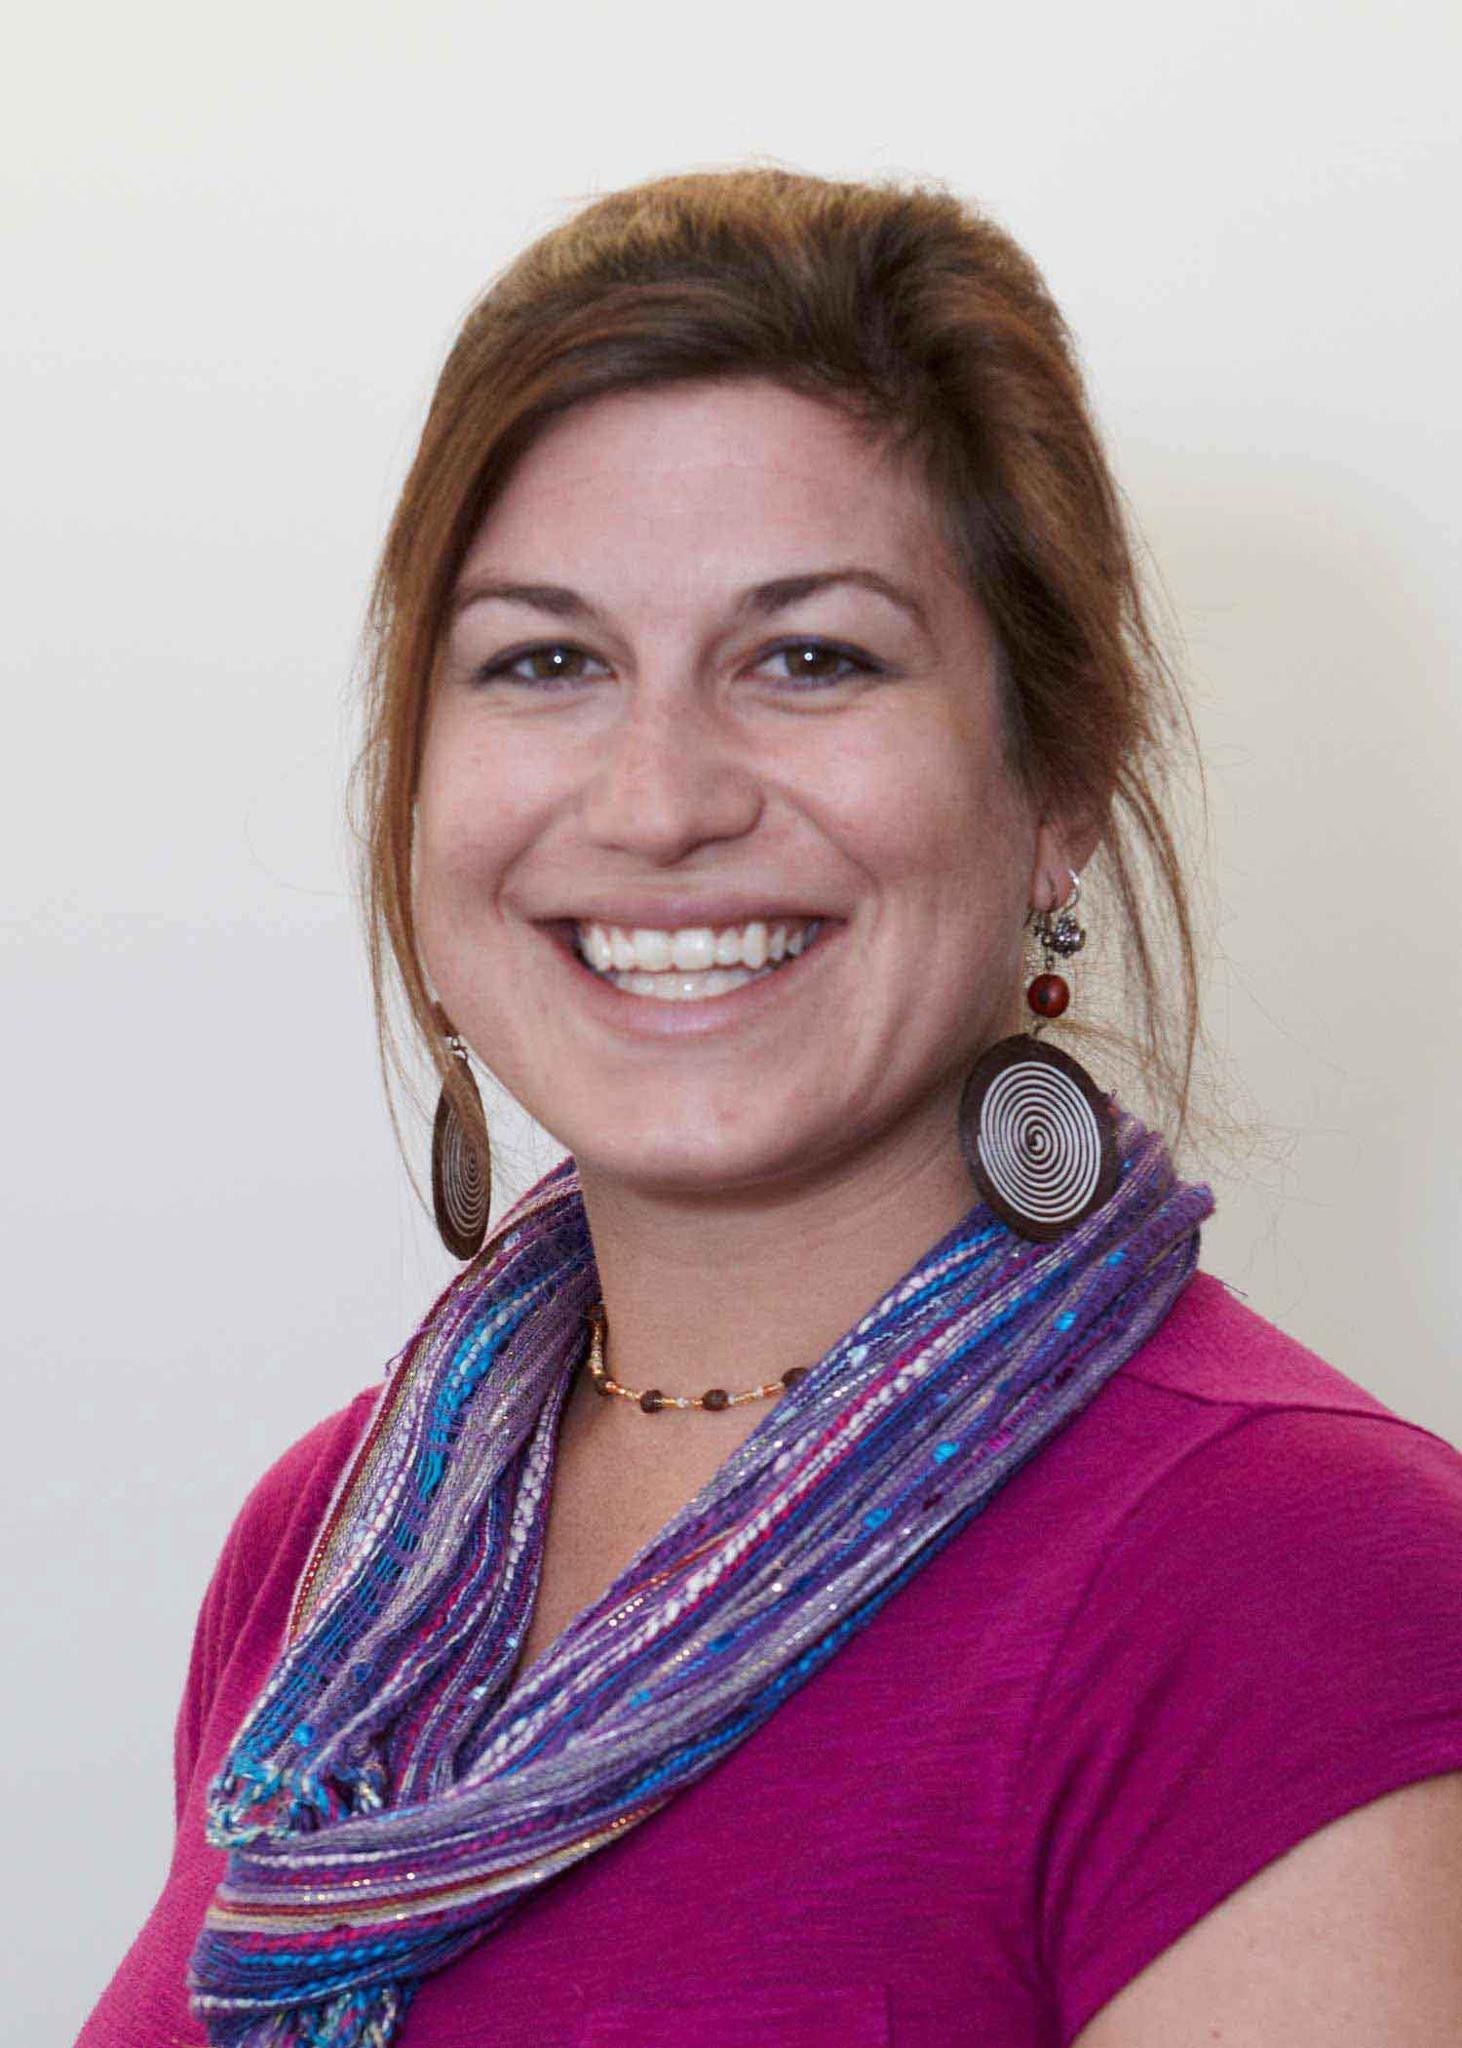 Stephanie A. Malin, Ph.D.; Associate Professor, Department of Sociology, Colorado State University; Associate Professor, Colorado School of Public Health